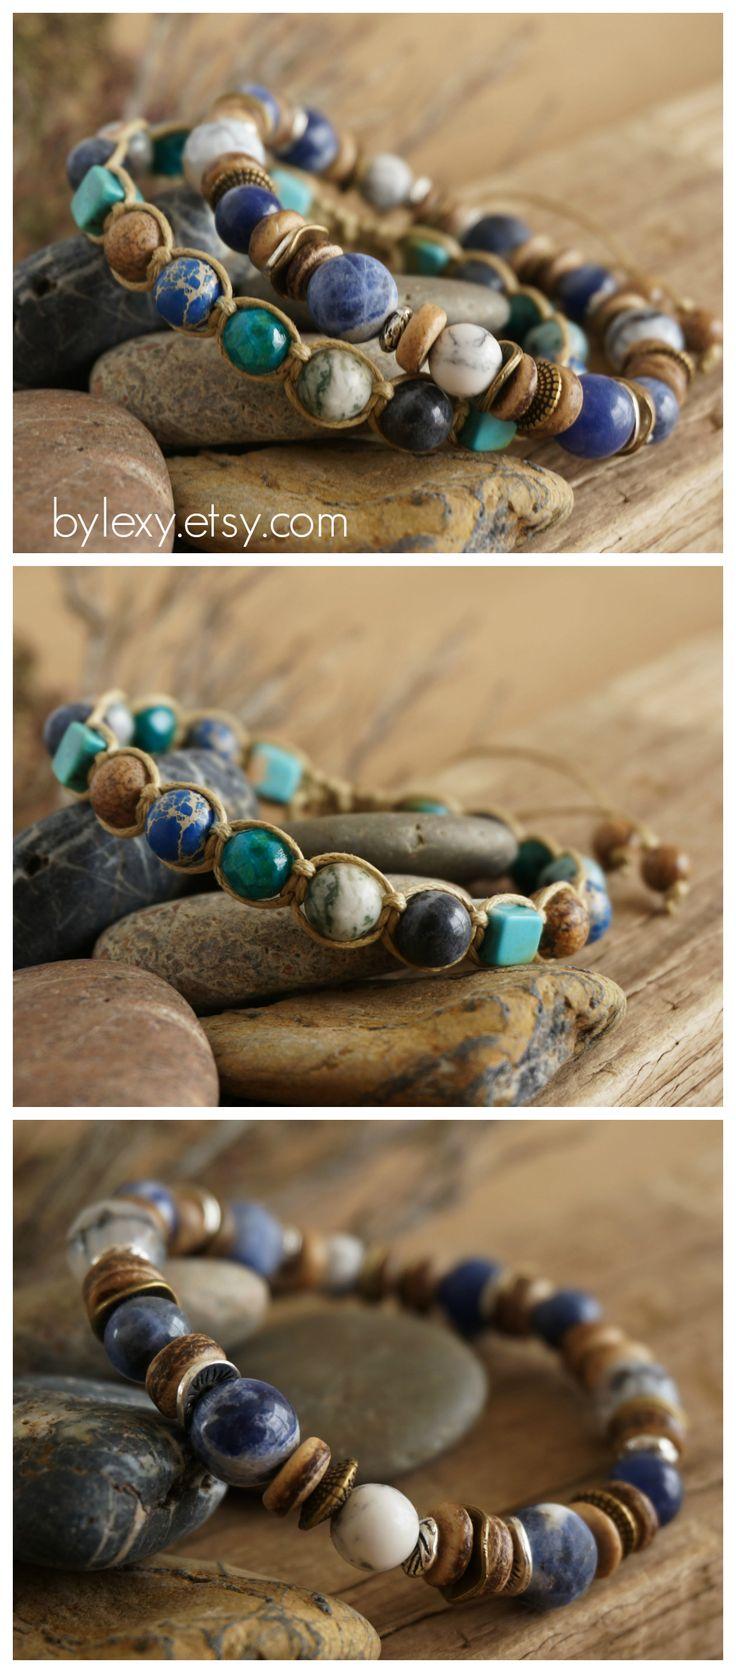 Boho Shamballa Bracelet, Bohemian Chic Hippie Gypsy Rustic Surfer Beach Hemp Macrame Shamballa Womens Mens Bracelet Jewelry ByLEXY